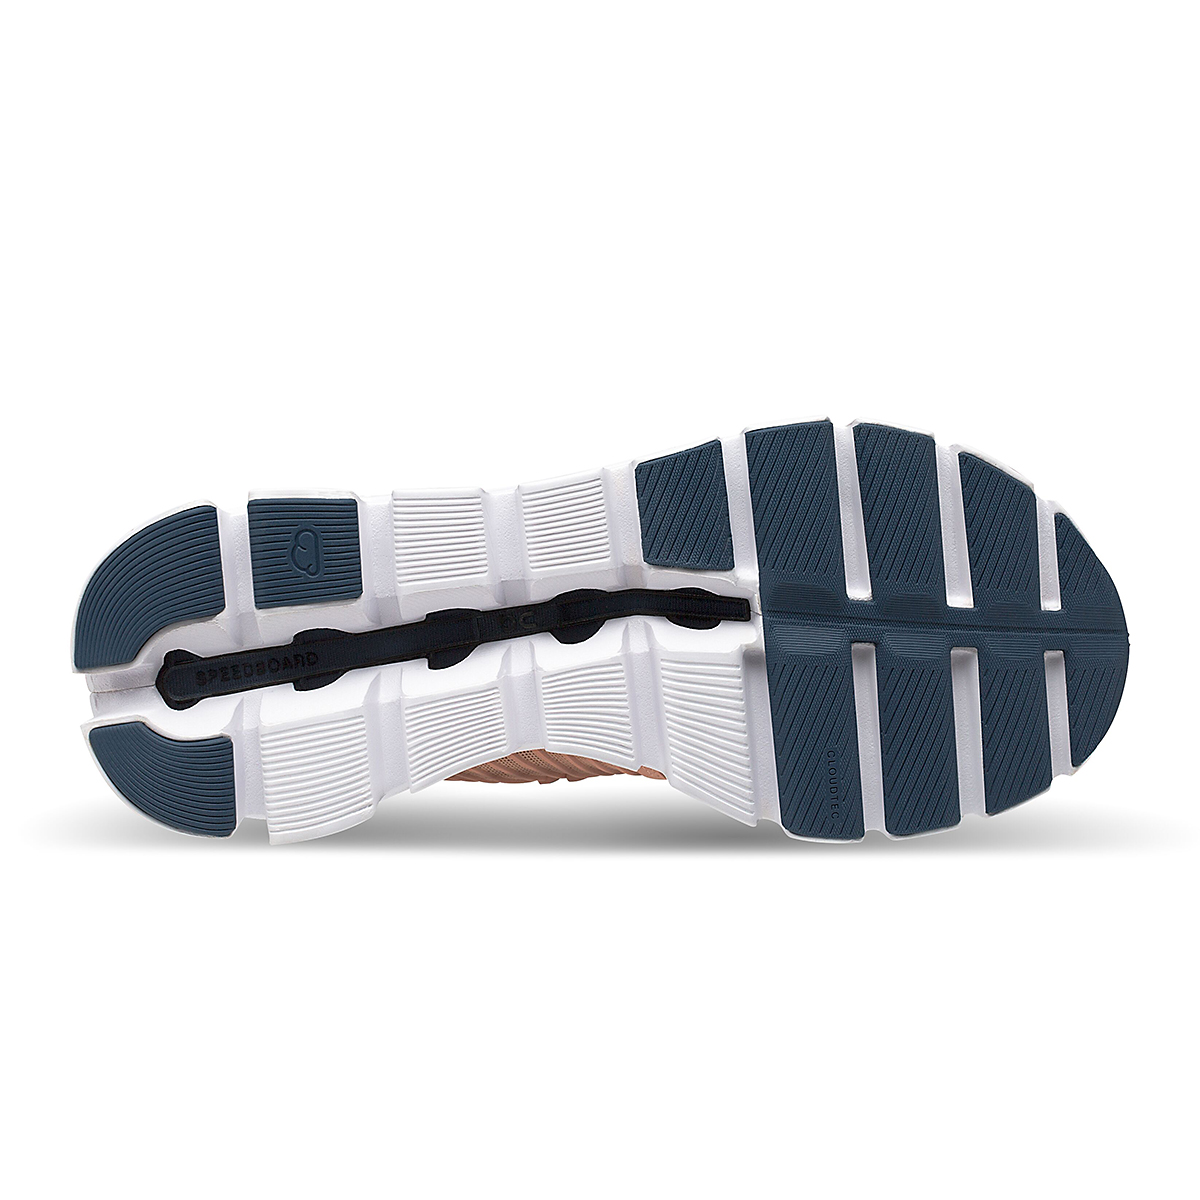 Women's On Cloudswift Running Shoe - Color: Blush/Denim - Size: 6 - Width: Regular, Blush/Denim, large, image 4